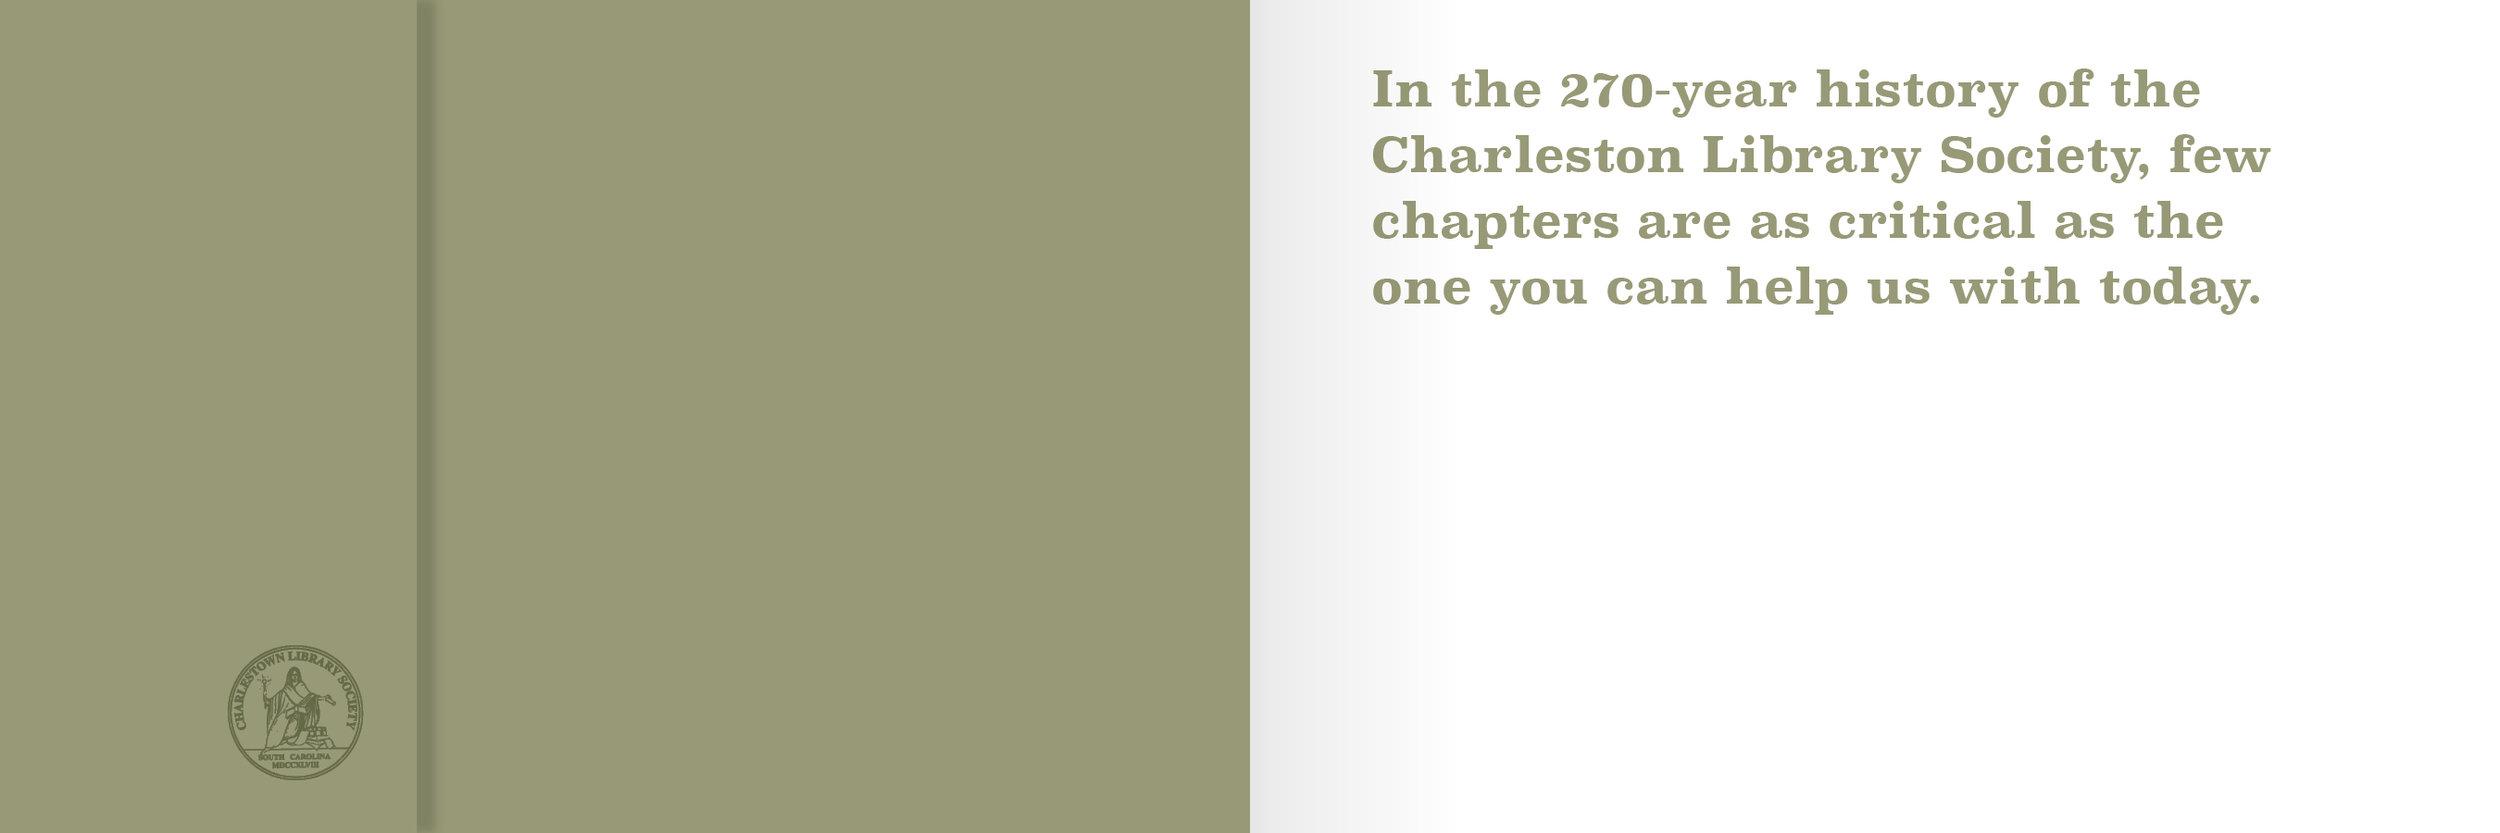 1703023 - Library Society REV2.jpg